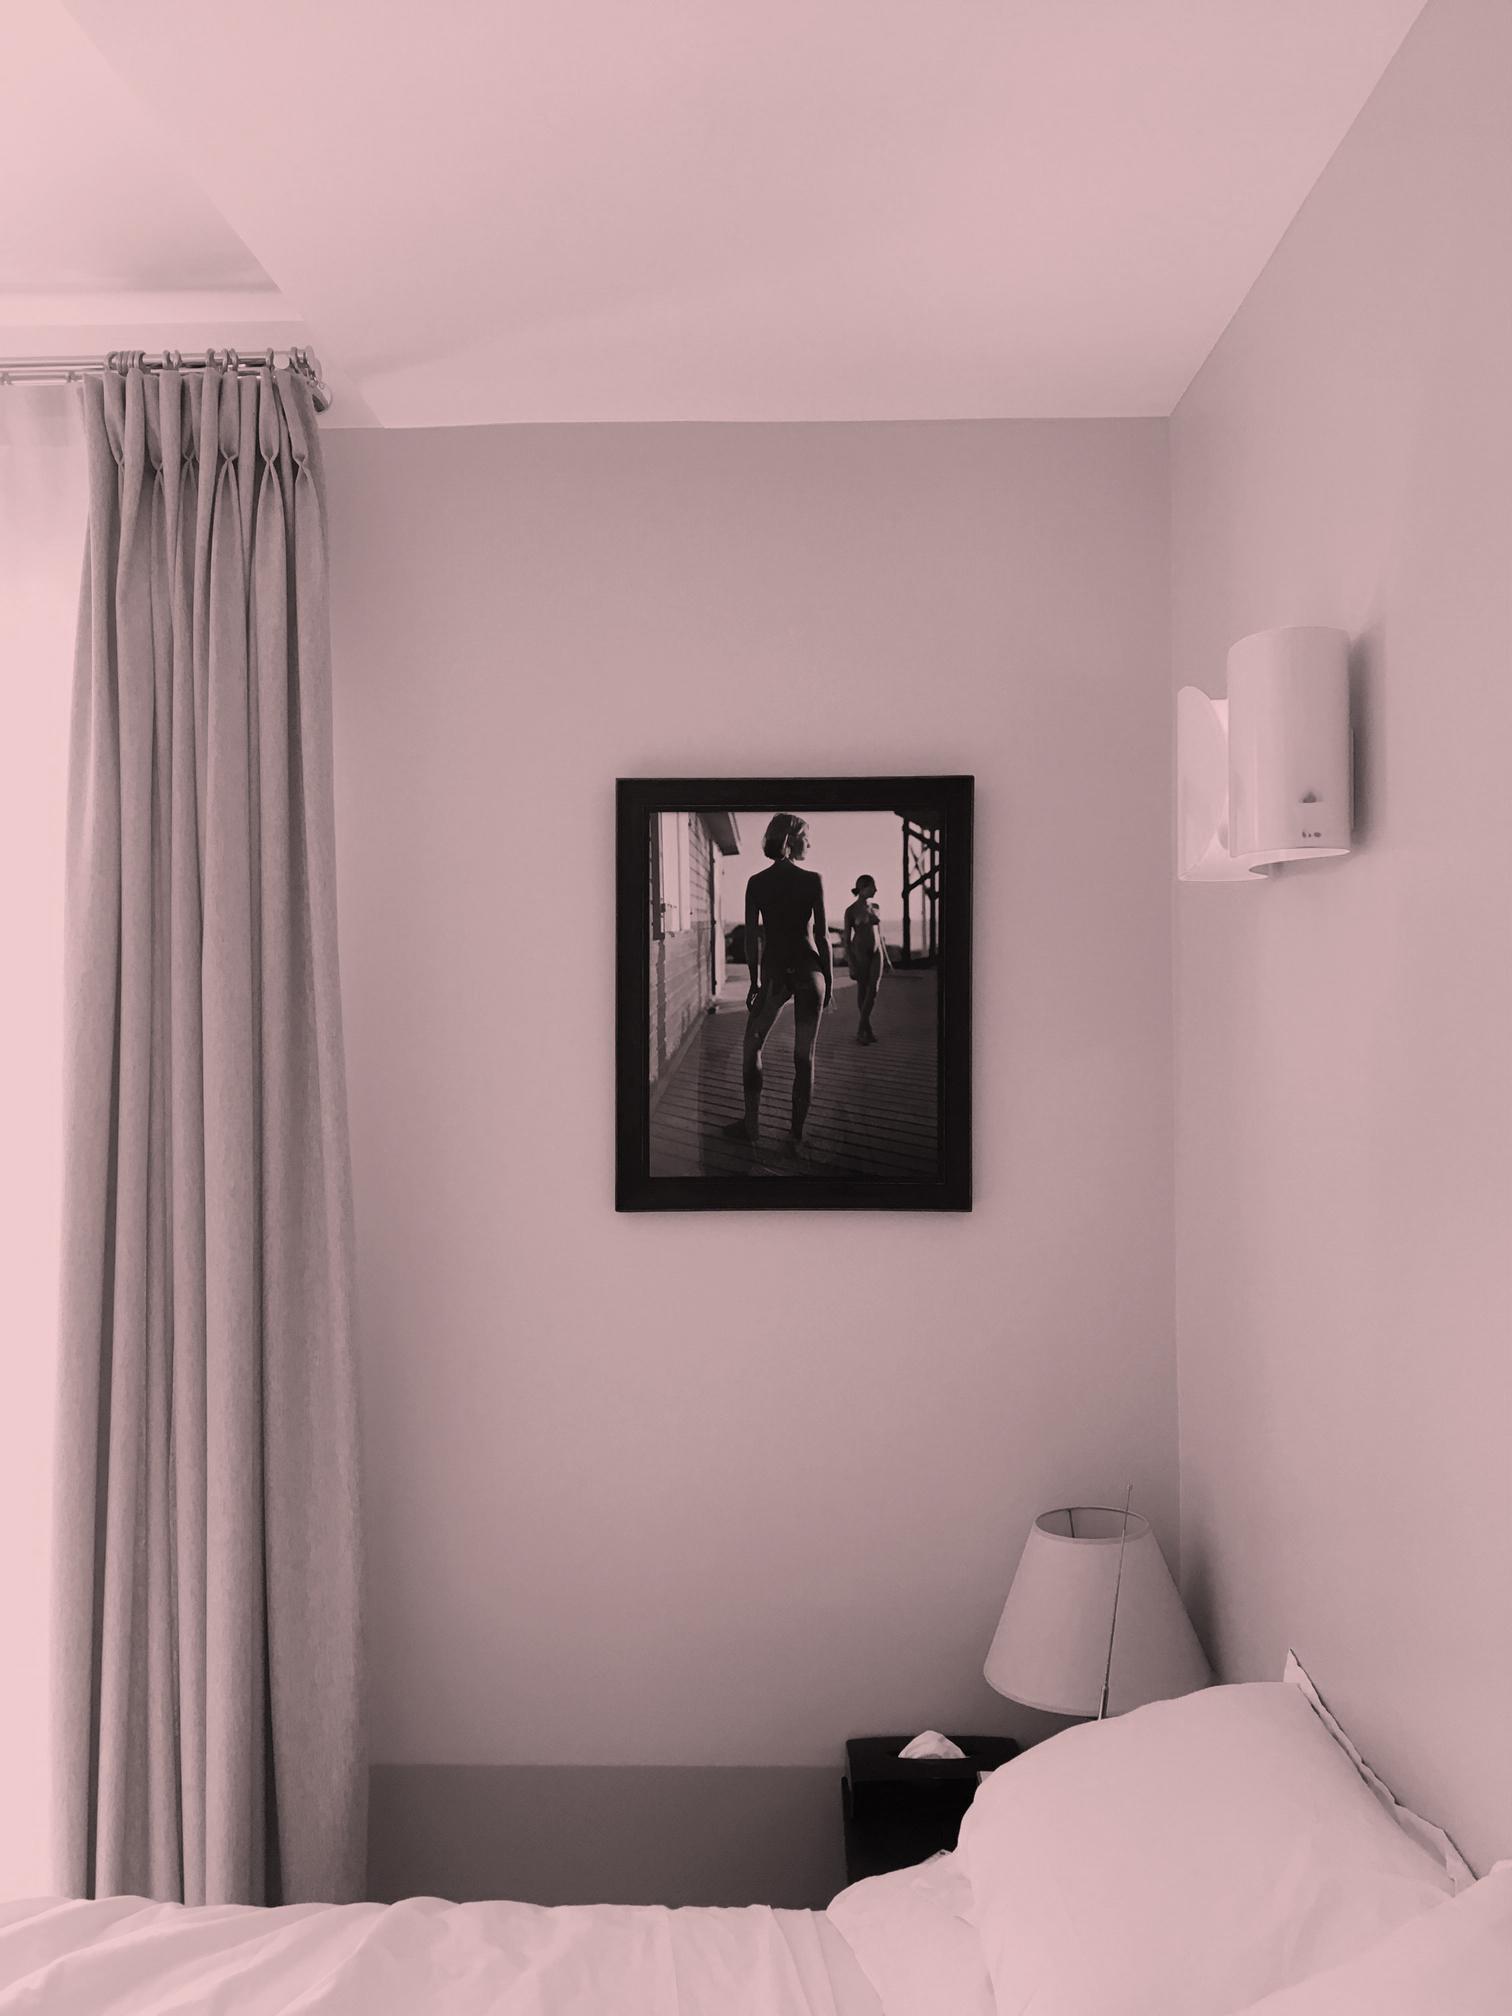 HOTEL-AMOUR-NICE-MD-ARCHITECTE-@MYLENEDUQUENOY-IMG_1704 copie